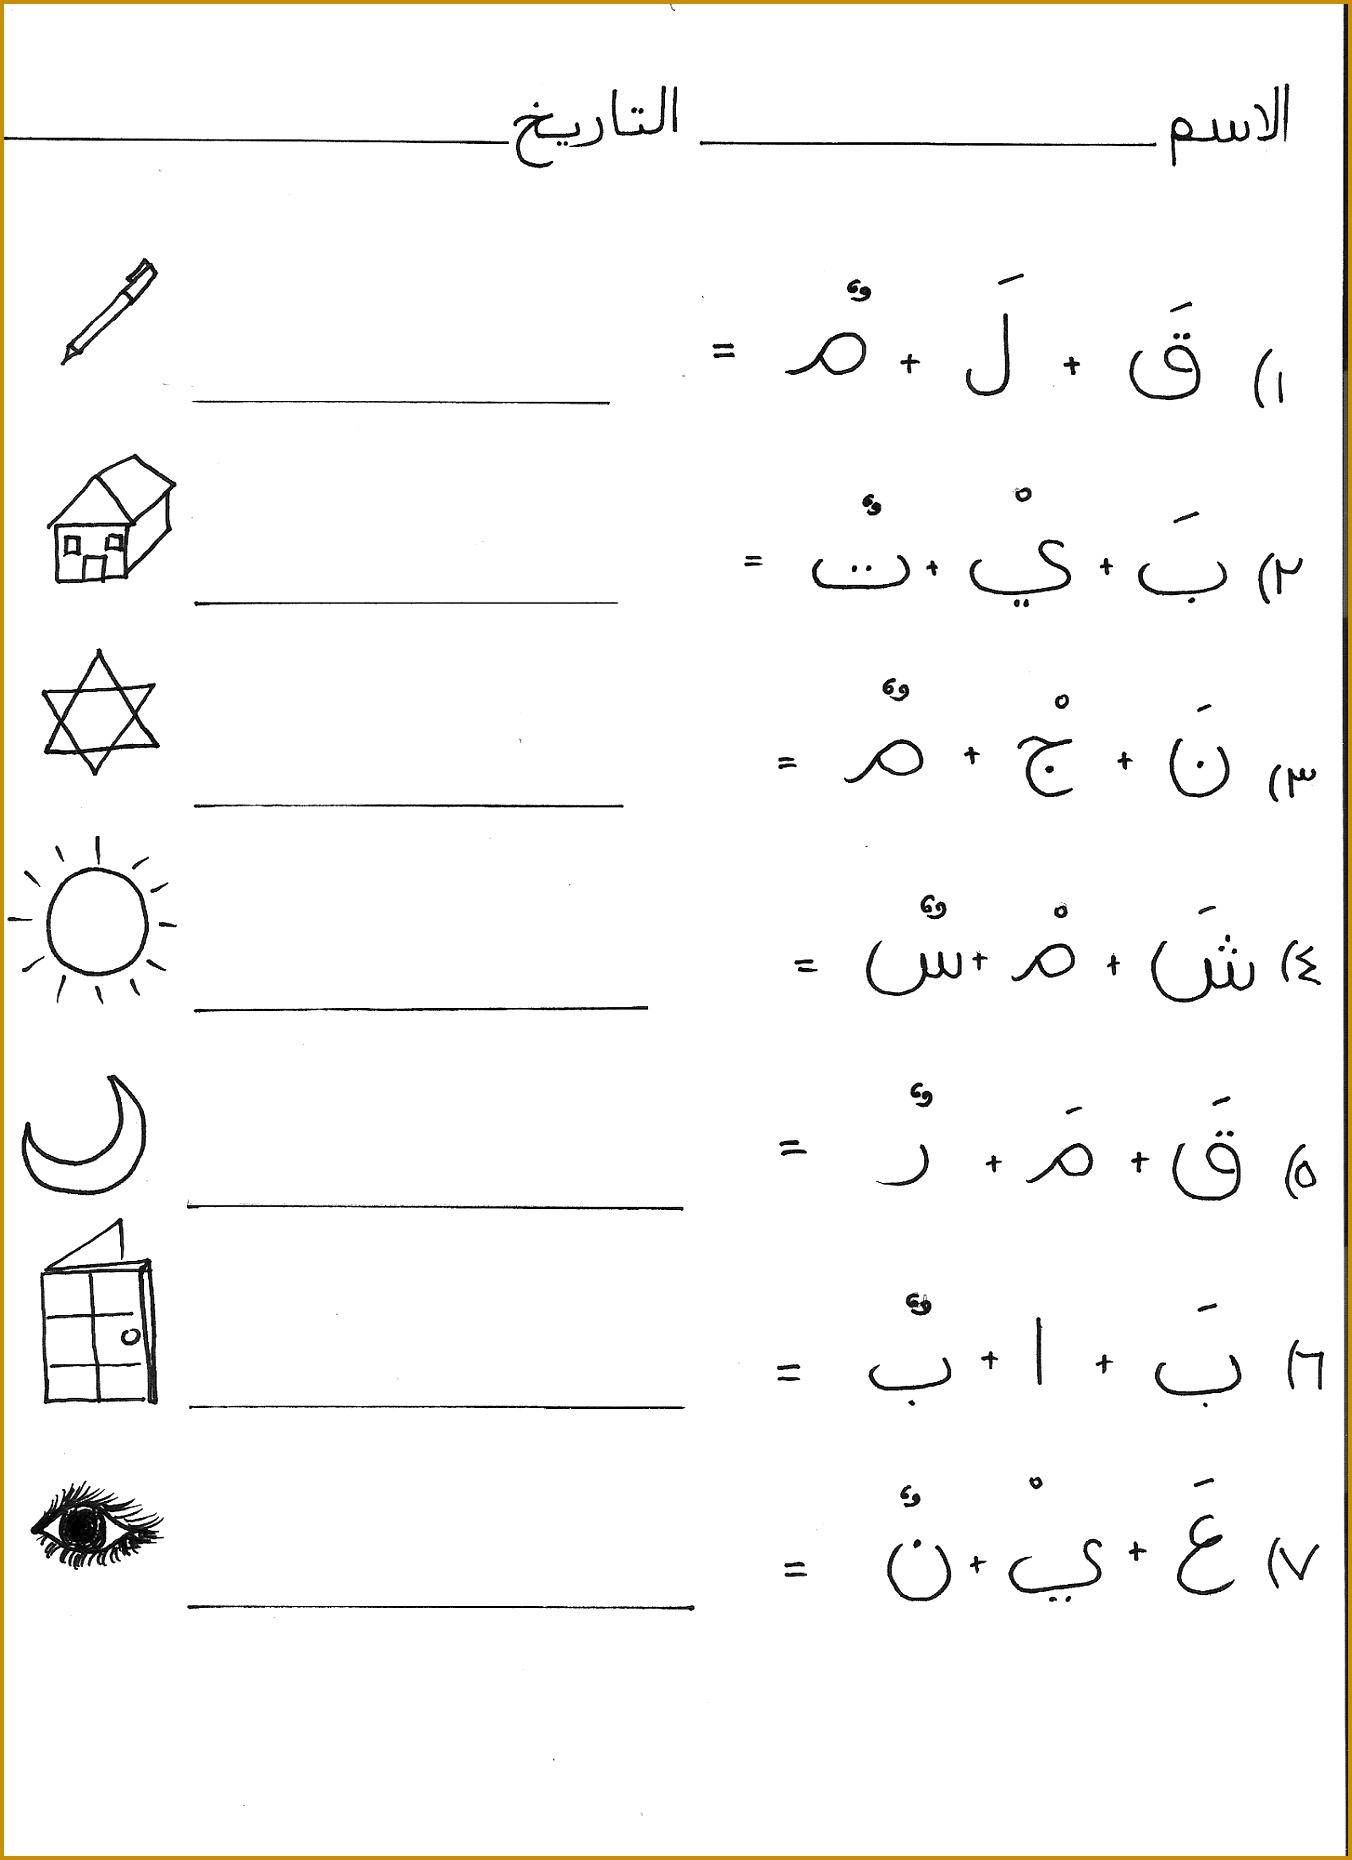 Arabic Alphabet Worksheets 13521860